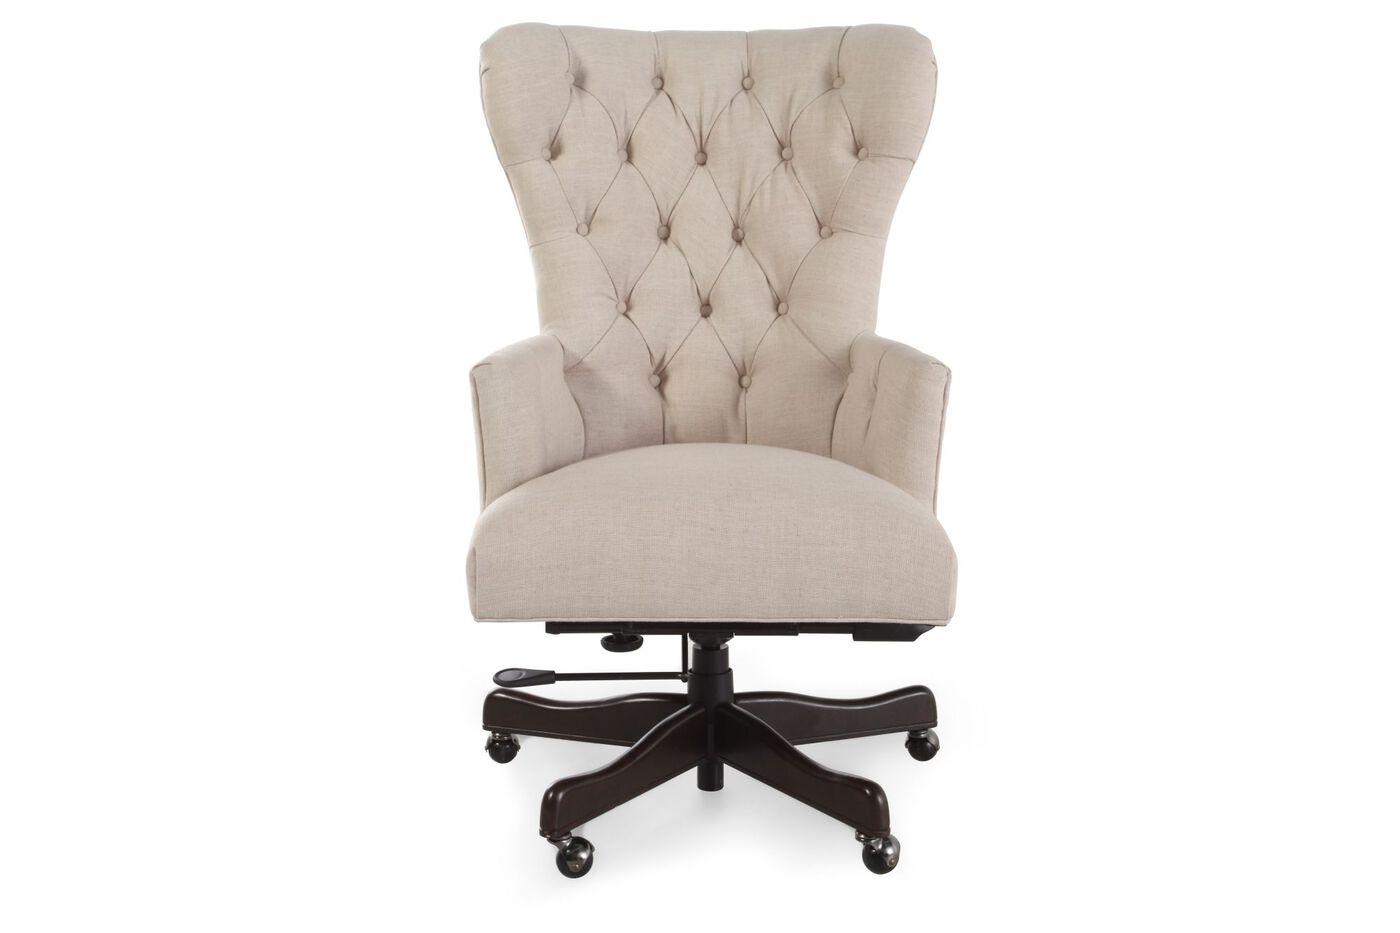 office chairs fabric. bradington young larkin oat fabric desk chair office chairs c